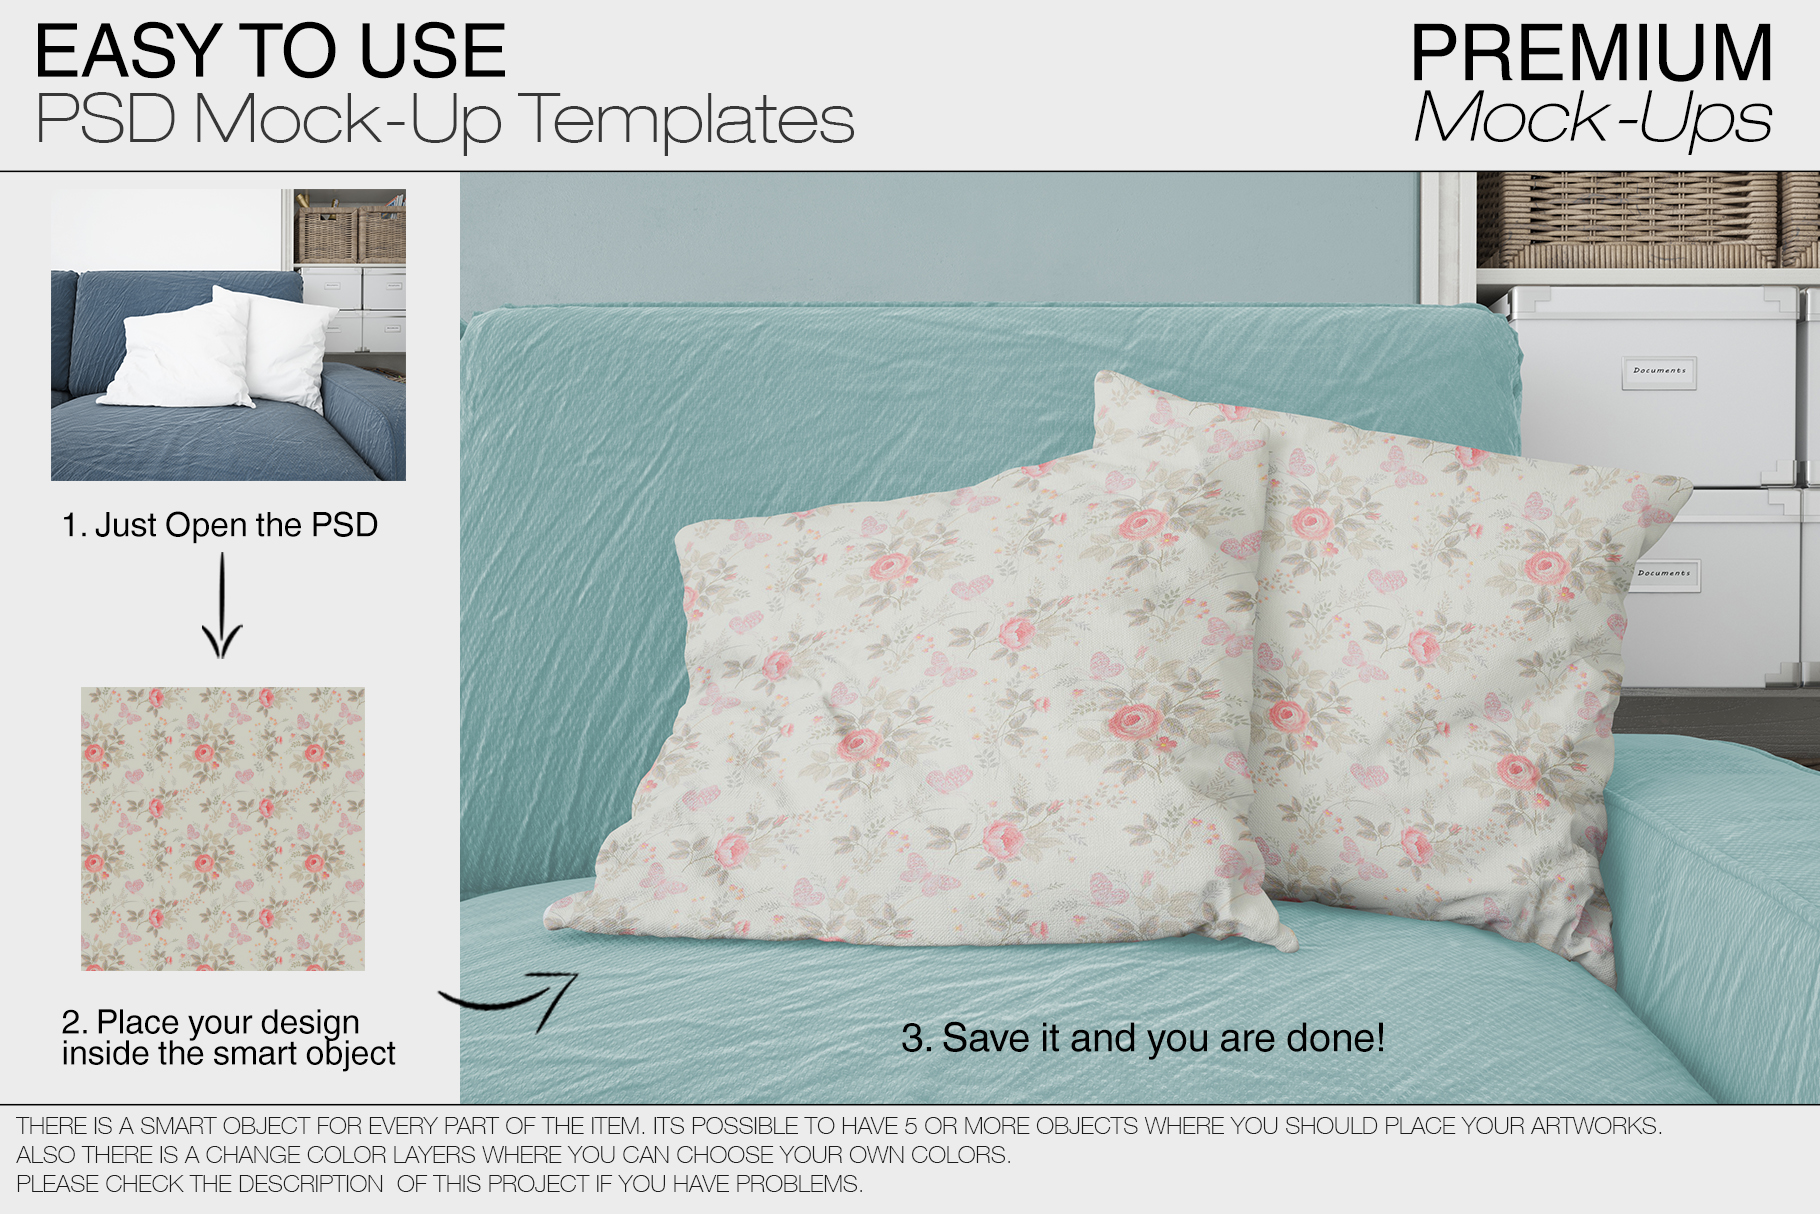 Pillows & Frames Mockup Set example image 9